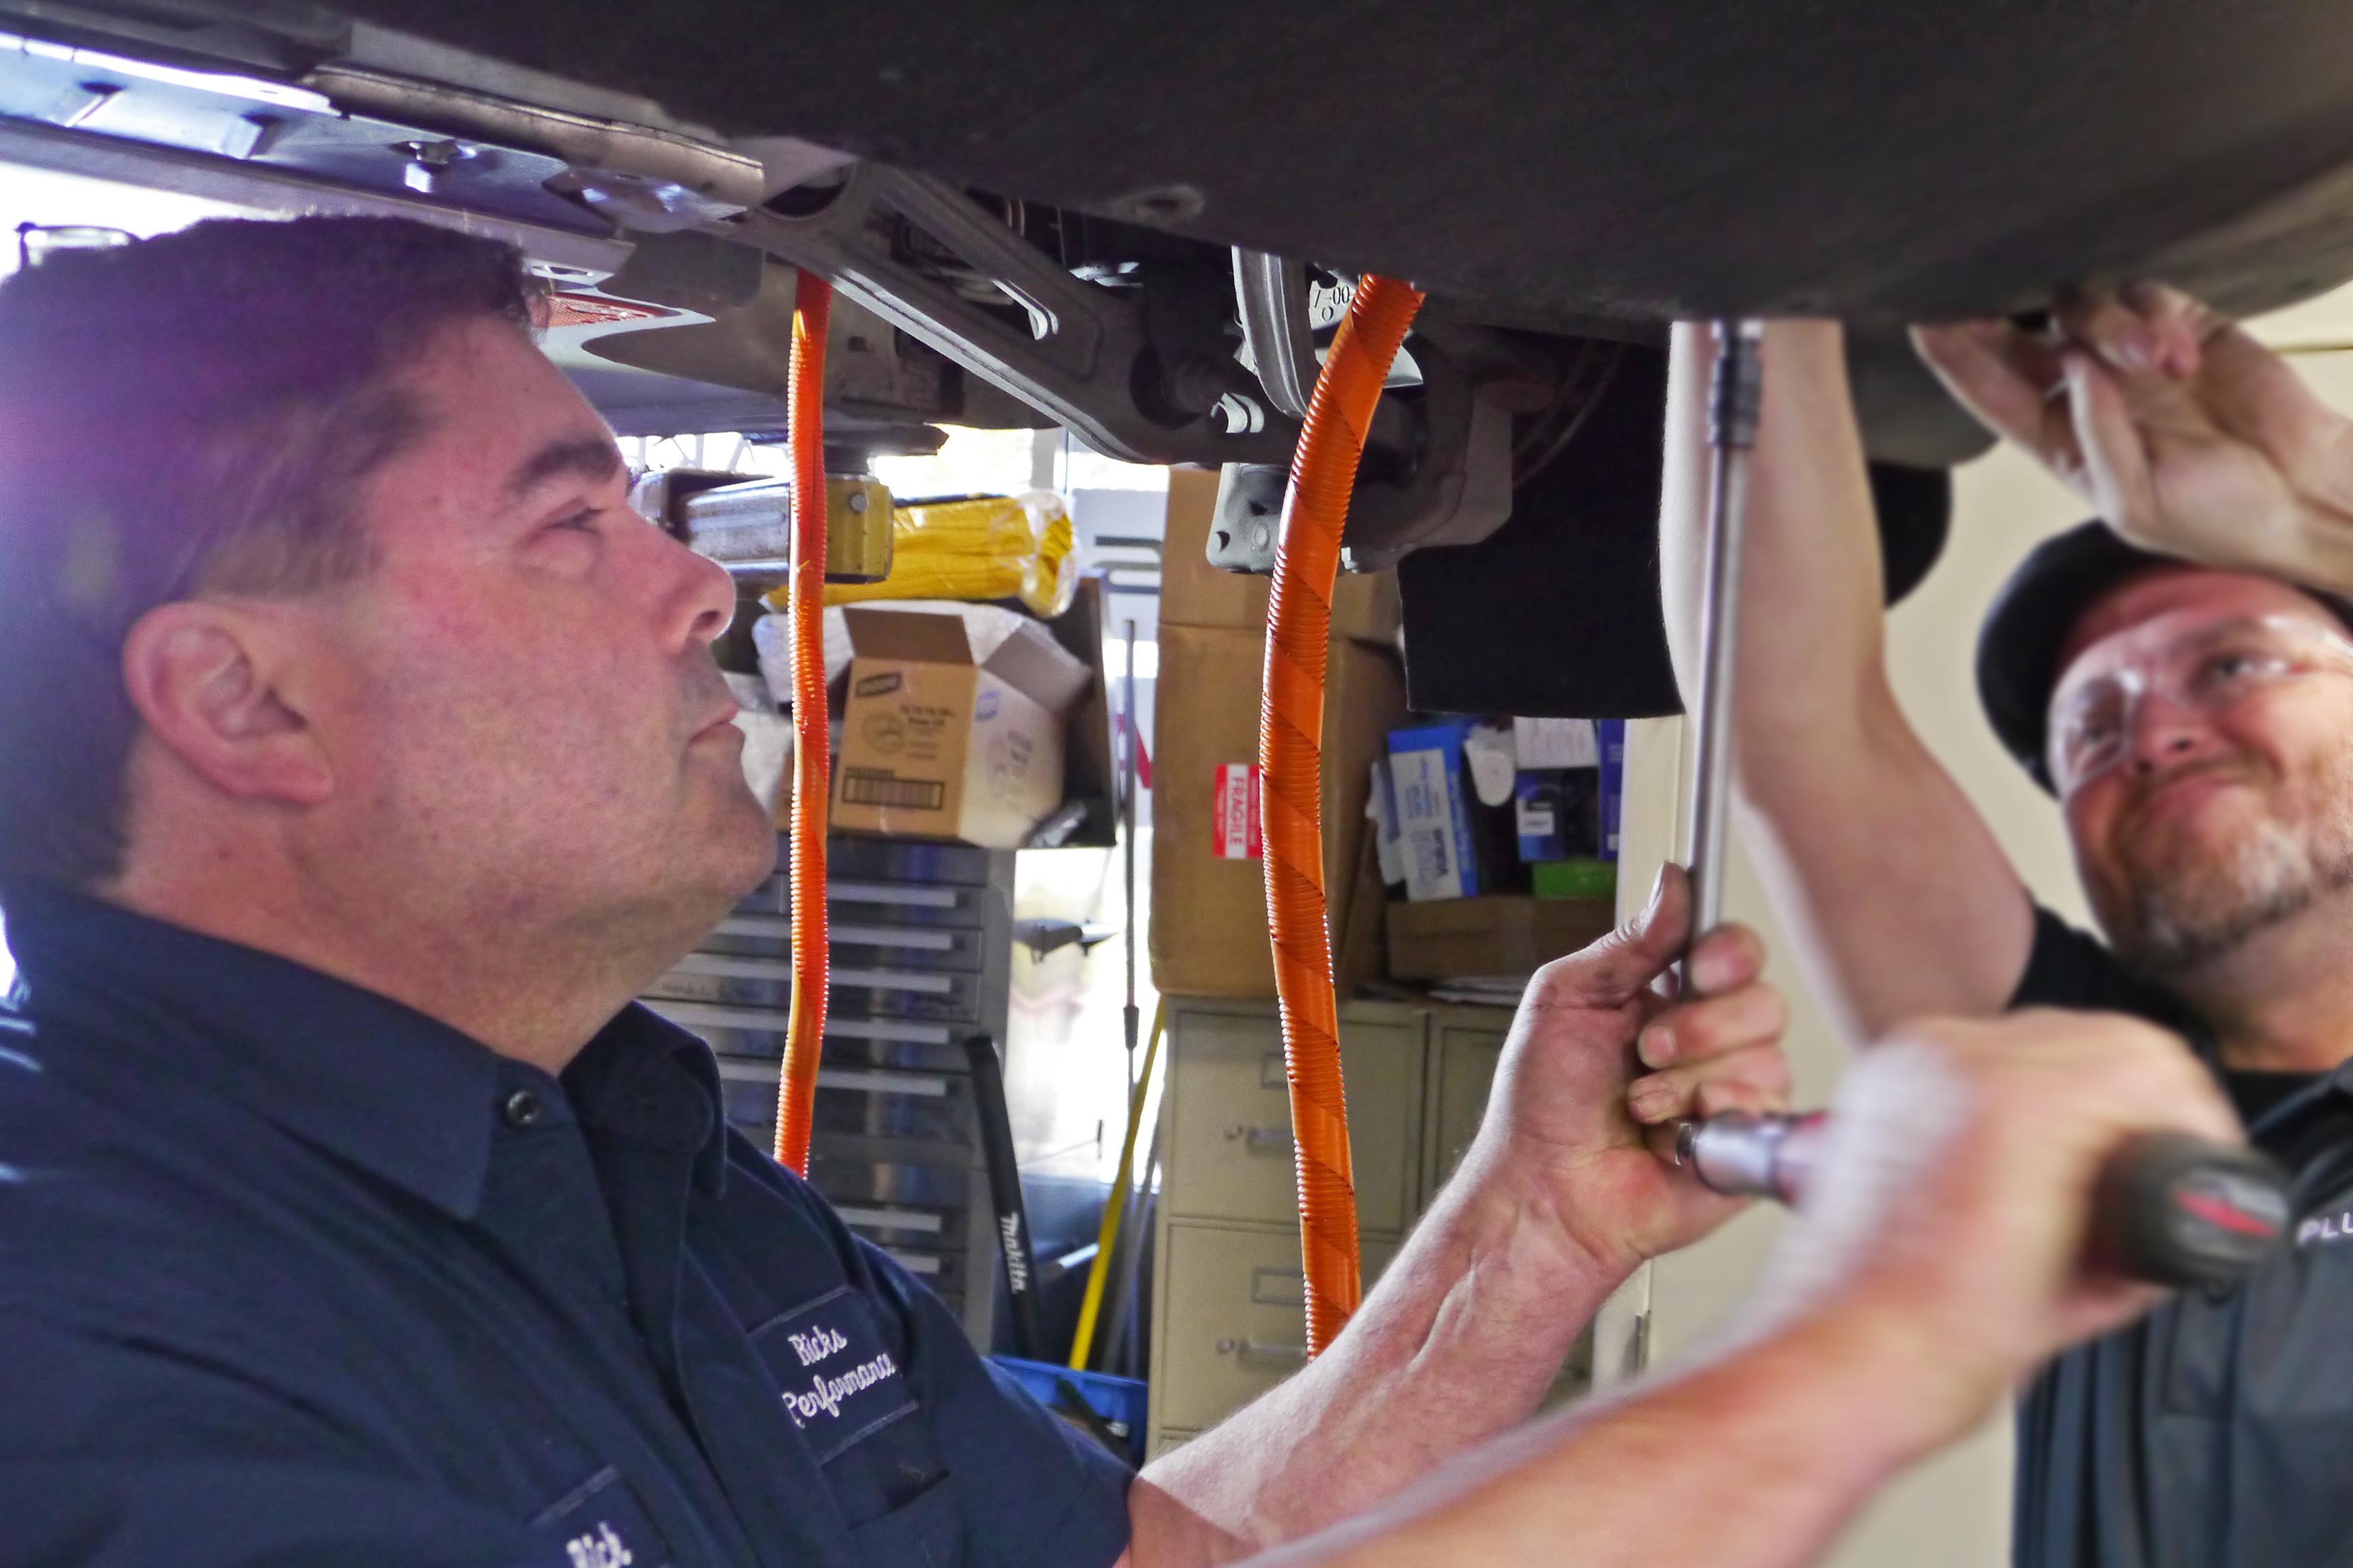 Tesla Owners Share Weird Ways of Unfreezing Charge Ports | Plugless